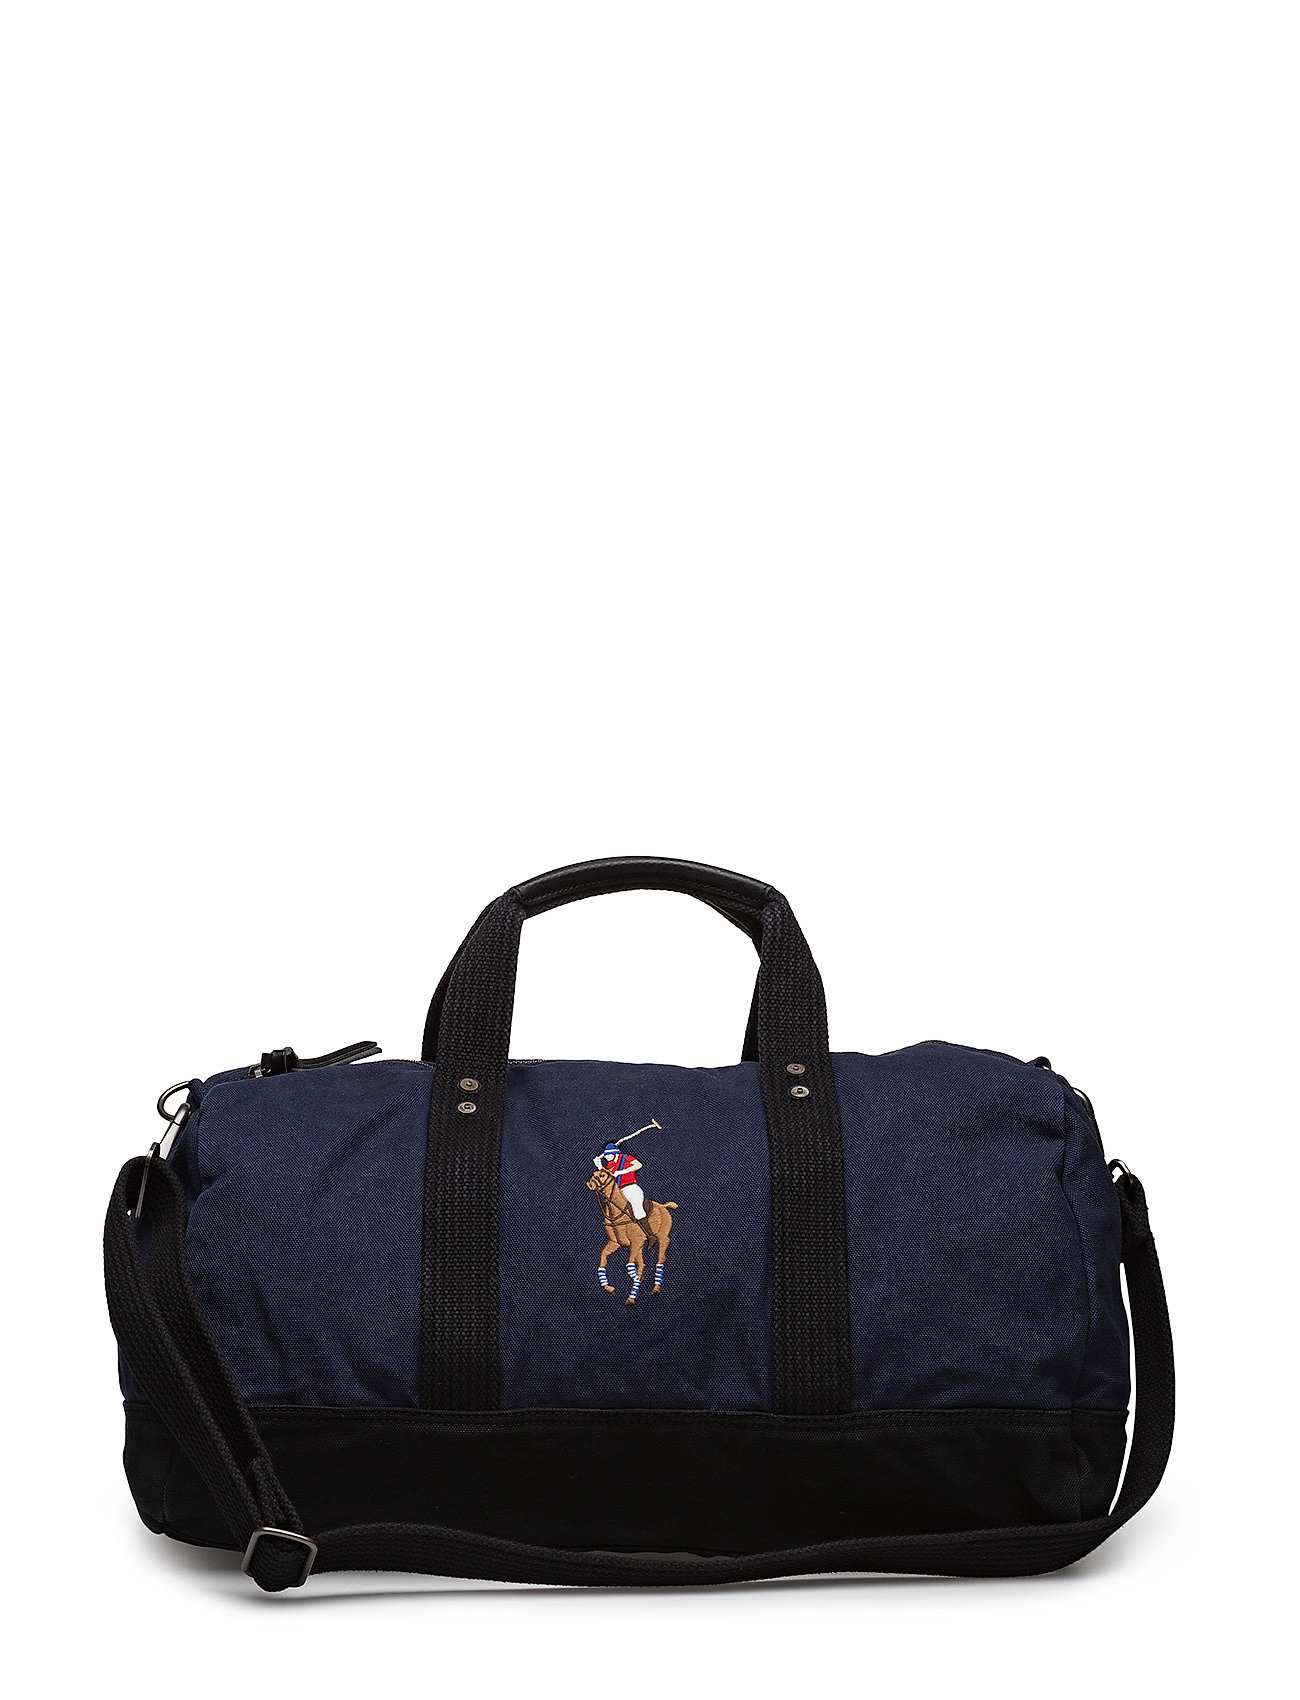 Polo Ralph Lauren Canvas Big Pony Duffel Bag - NAVY/BLACK